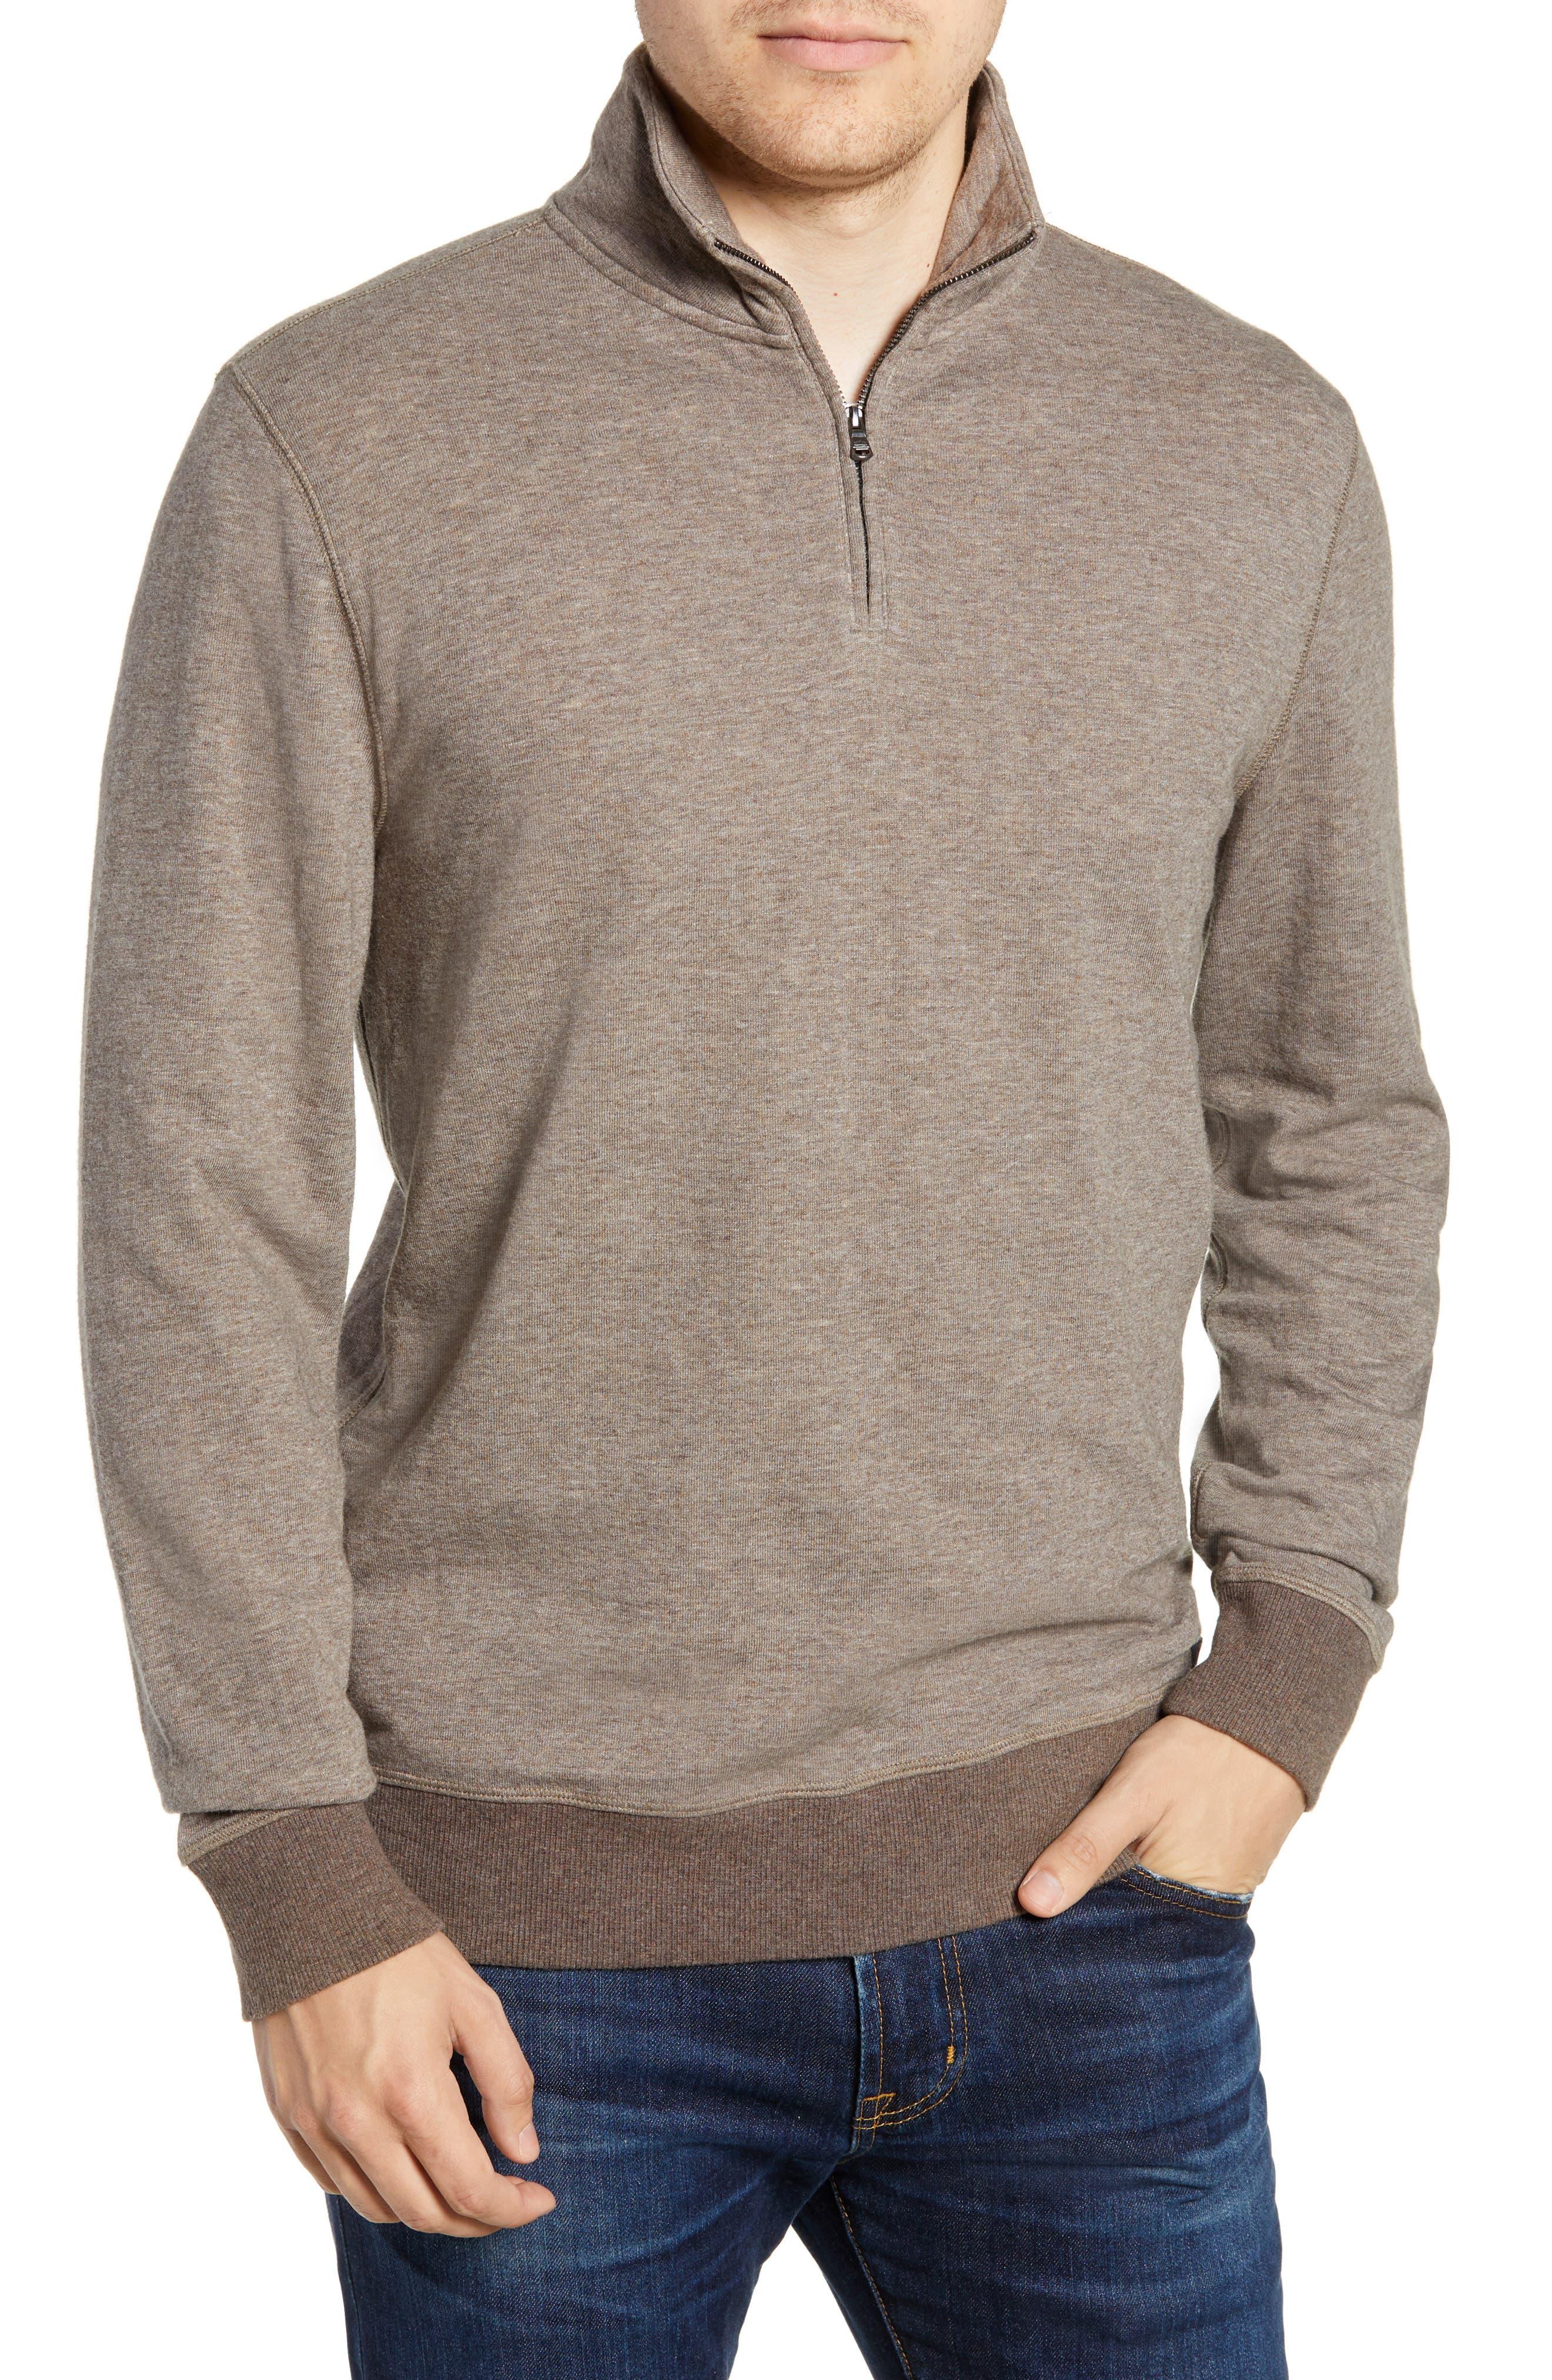 Dual Knit Regular Fit Quarter Zip Pullover, Main, color, CHESTNUT